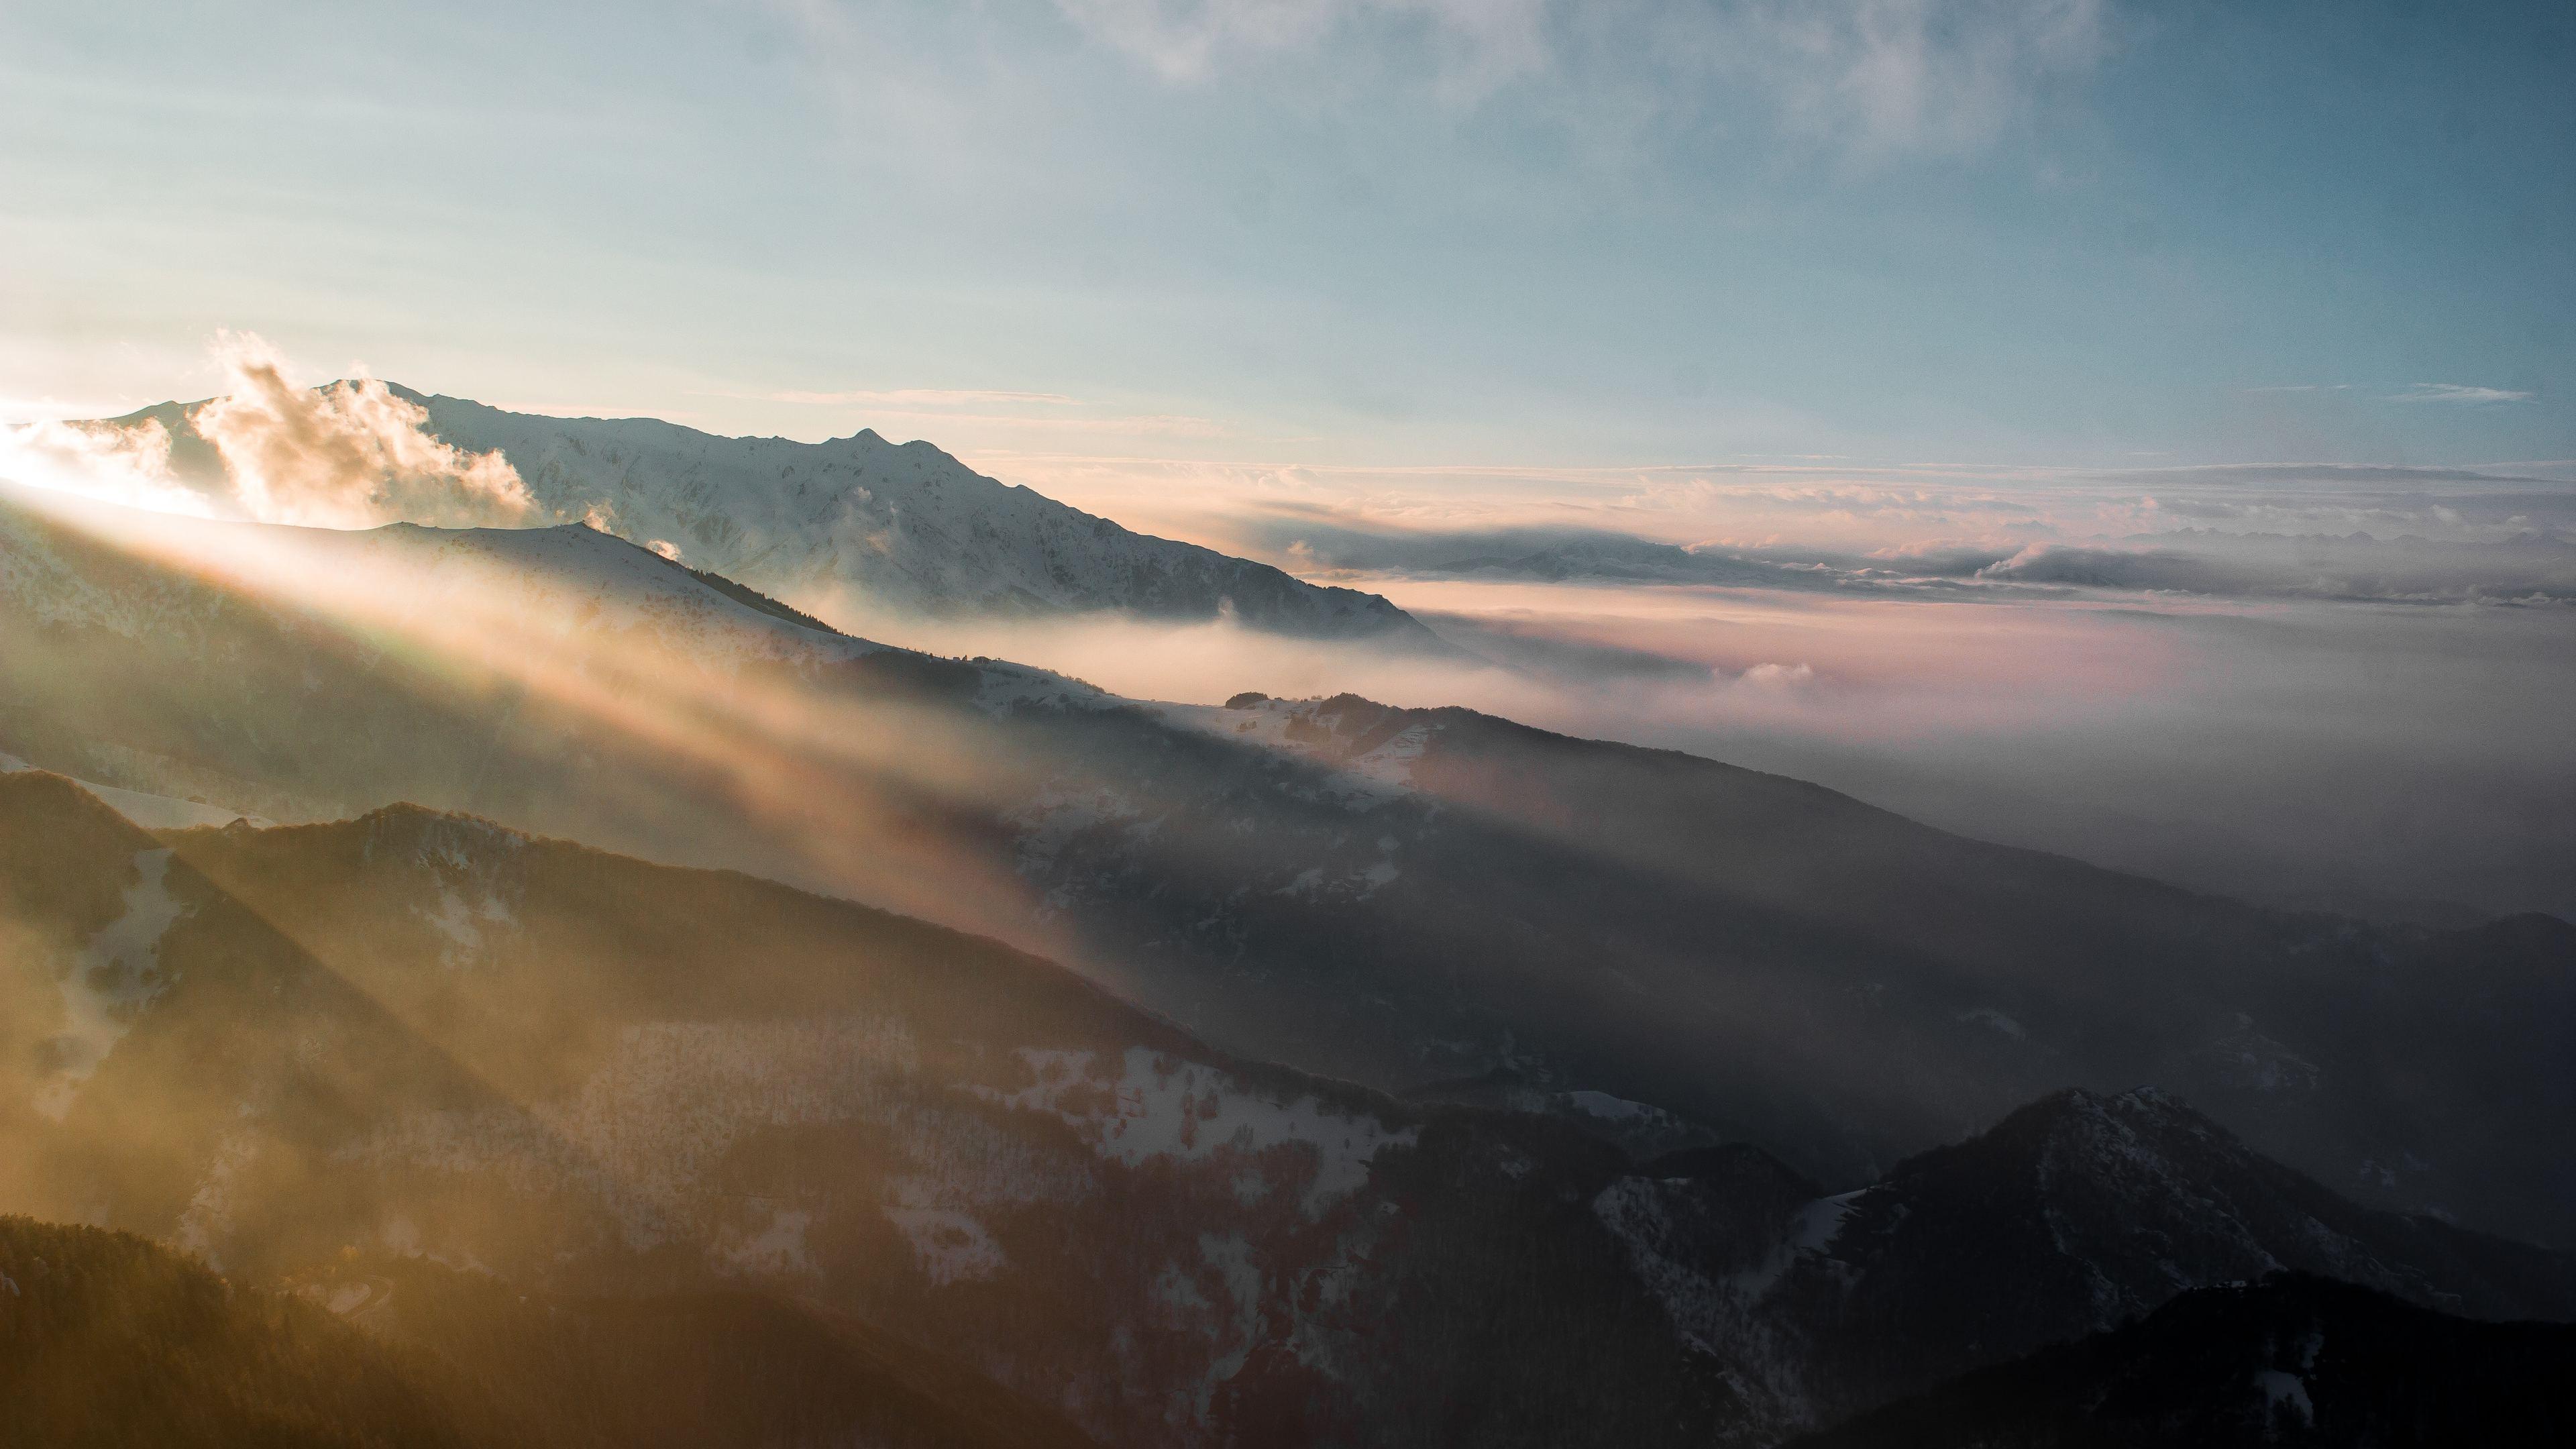 sun rays through mountains 1540140959 - Sun Rays Through Mountains - sunbeam wallpapers, nature wallpapers, mountains wallpapers, hd-wallpapers, 4k-wallpapers